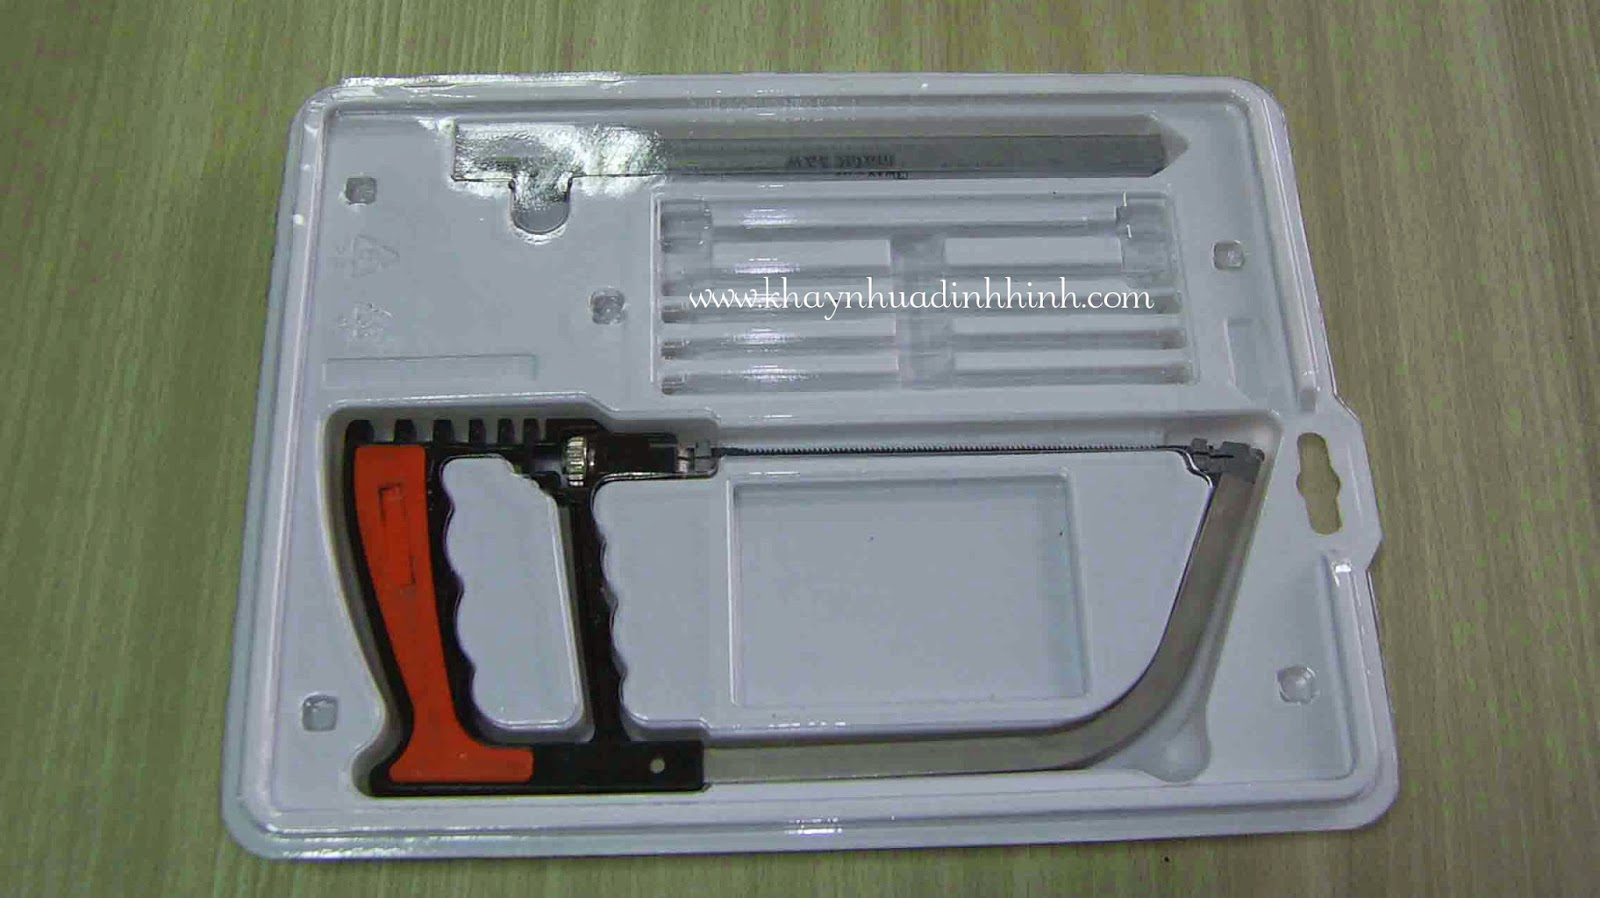 Khay Nhựa PET 04